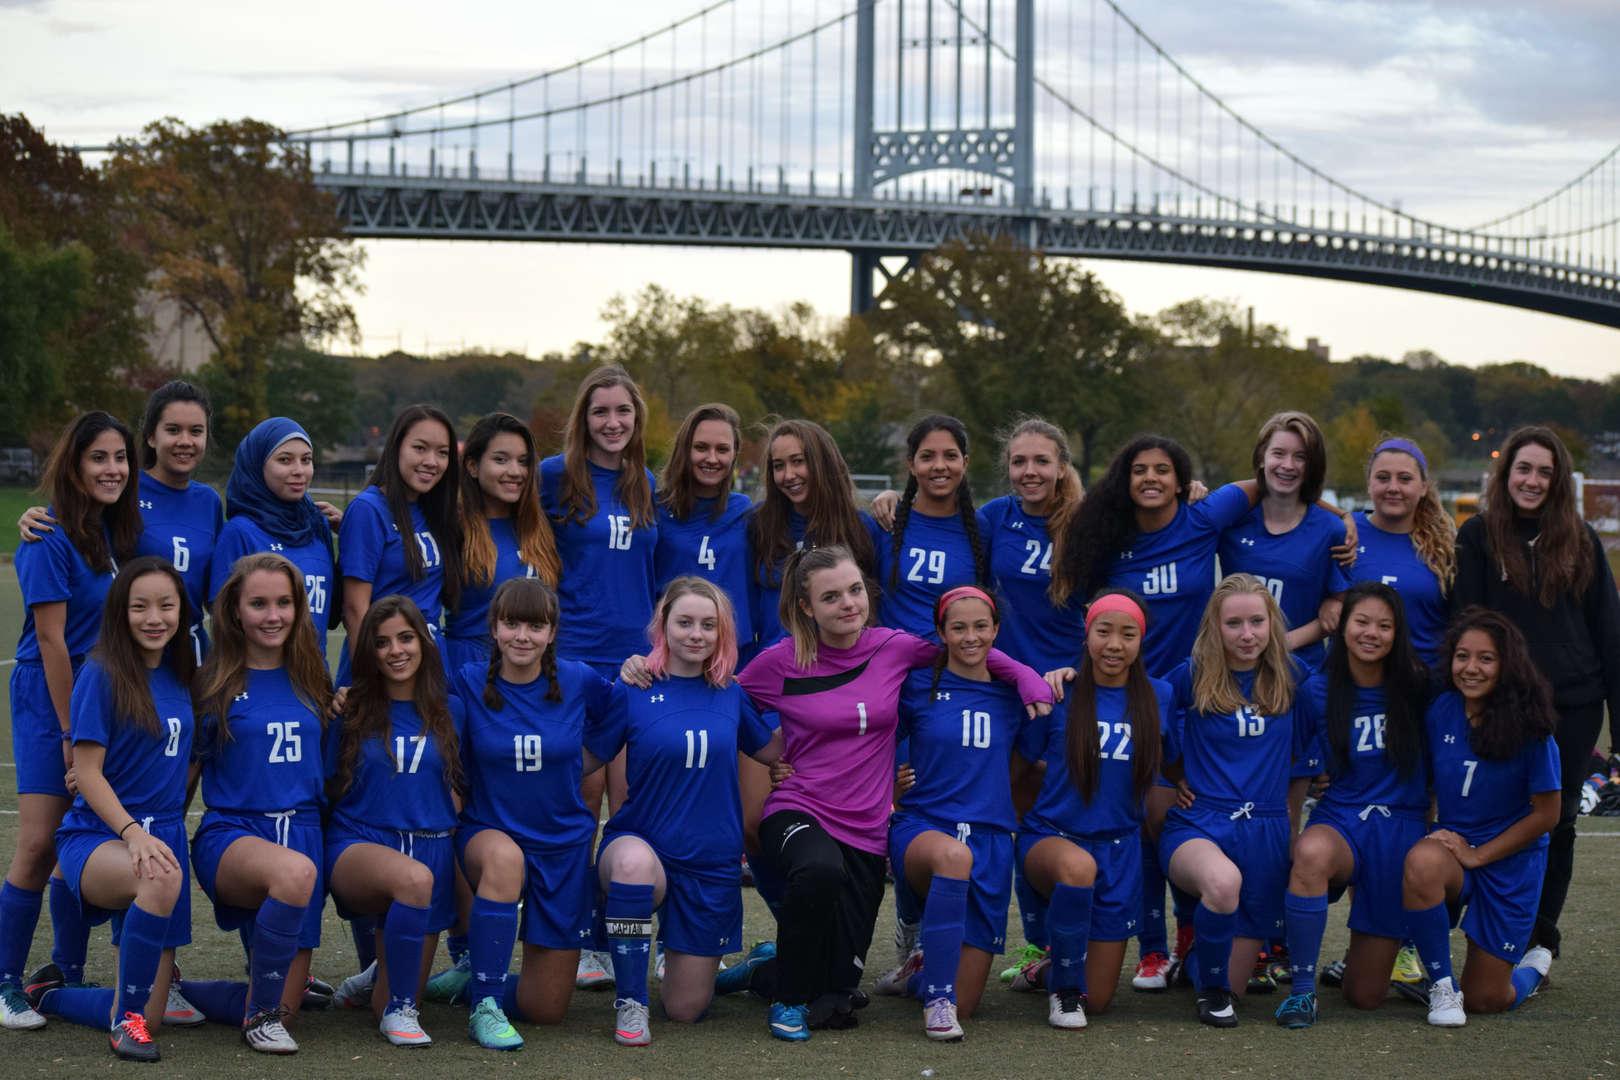 The BSGE girls' soccer team